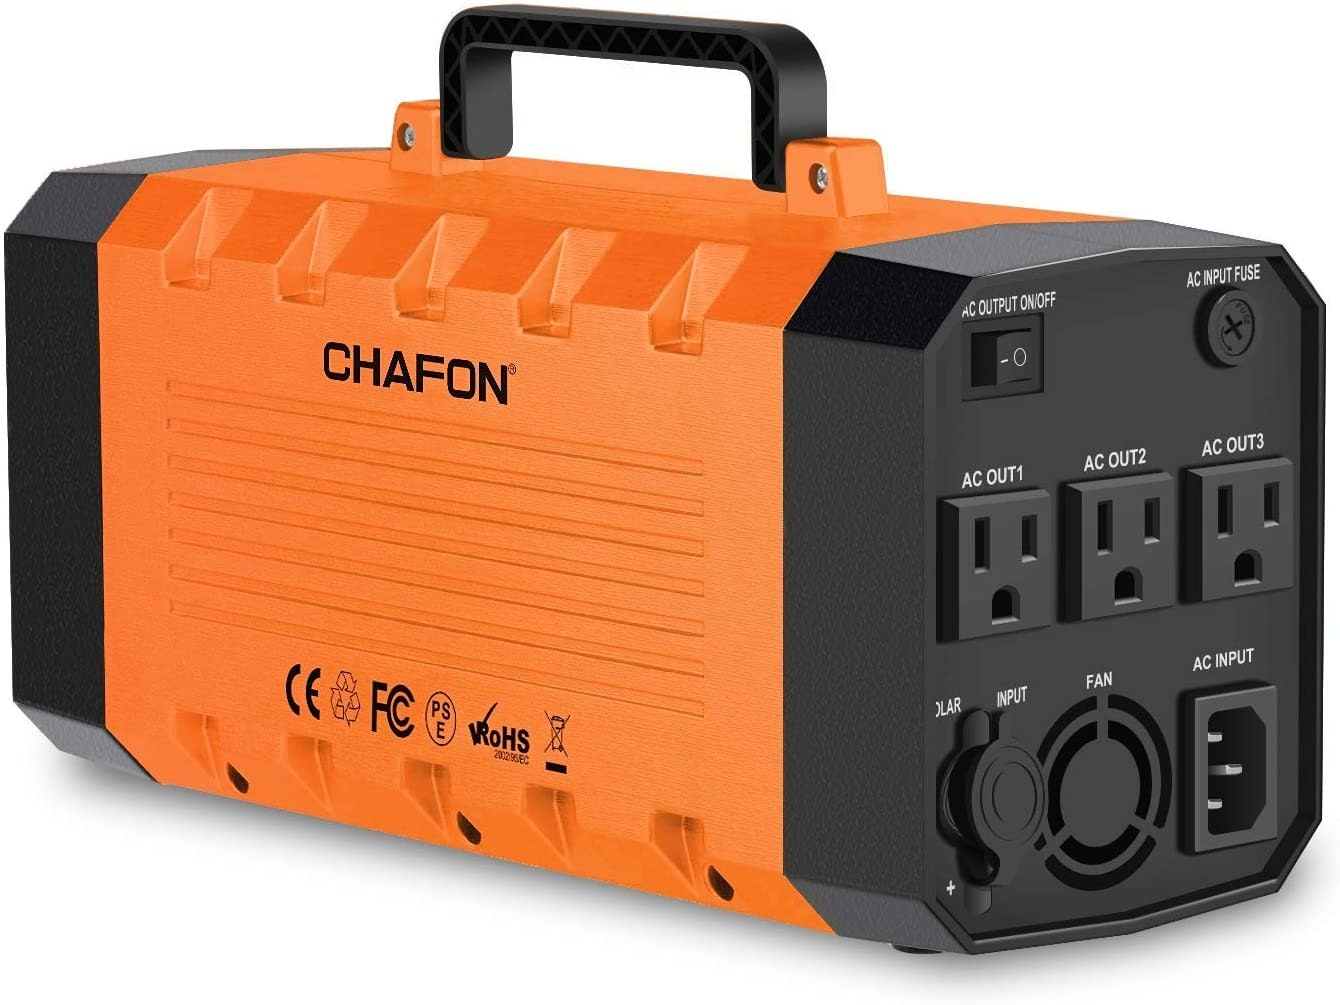 Chafon Inverter Generator